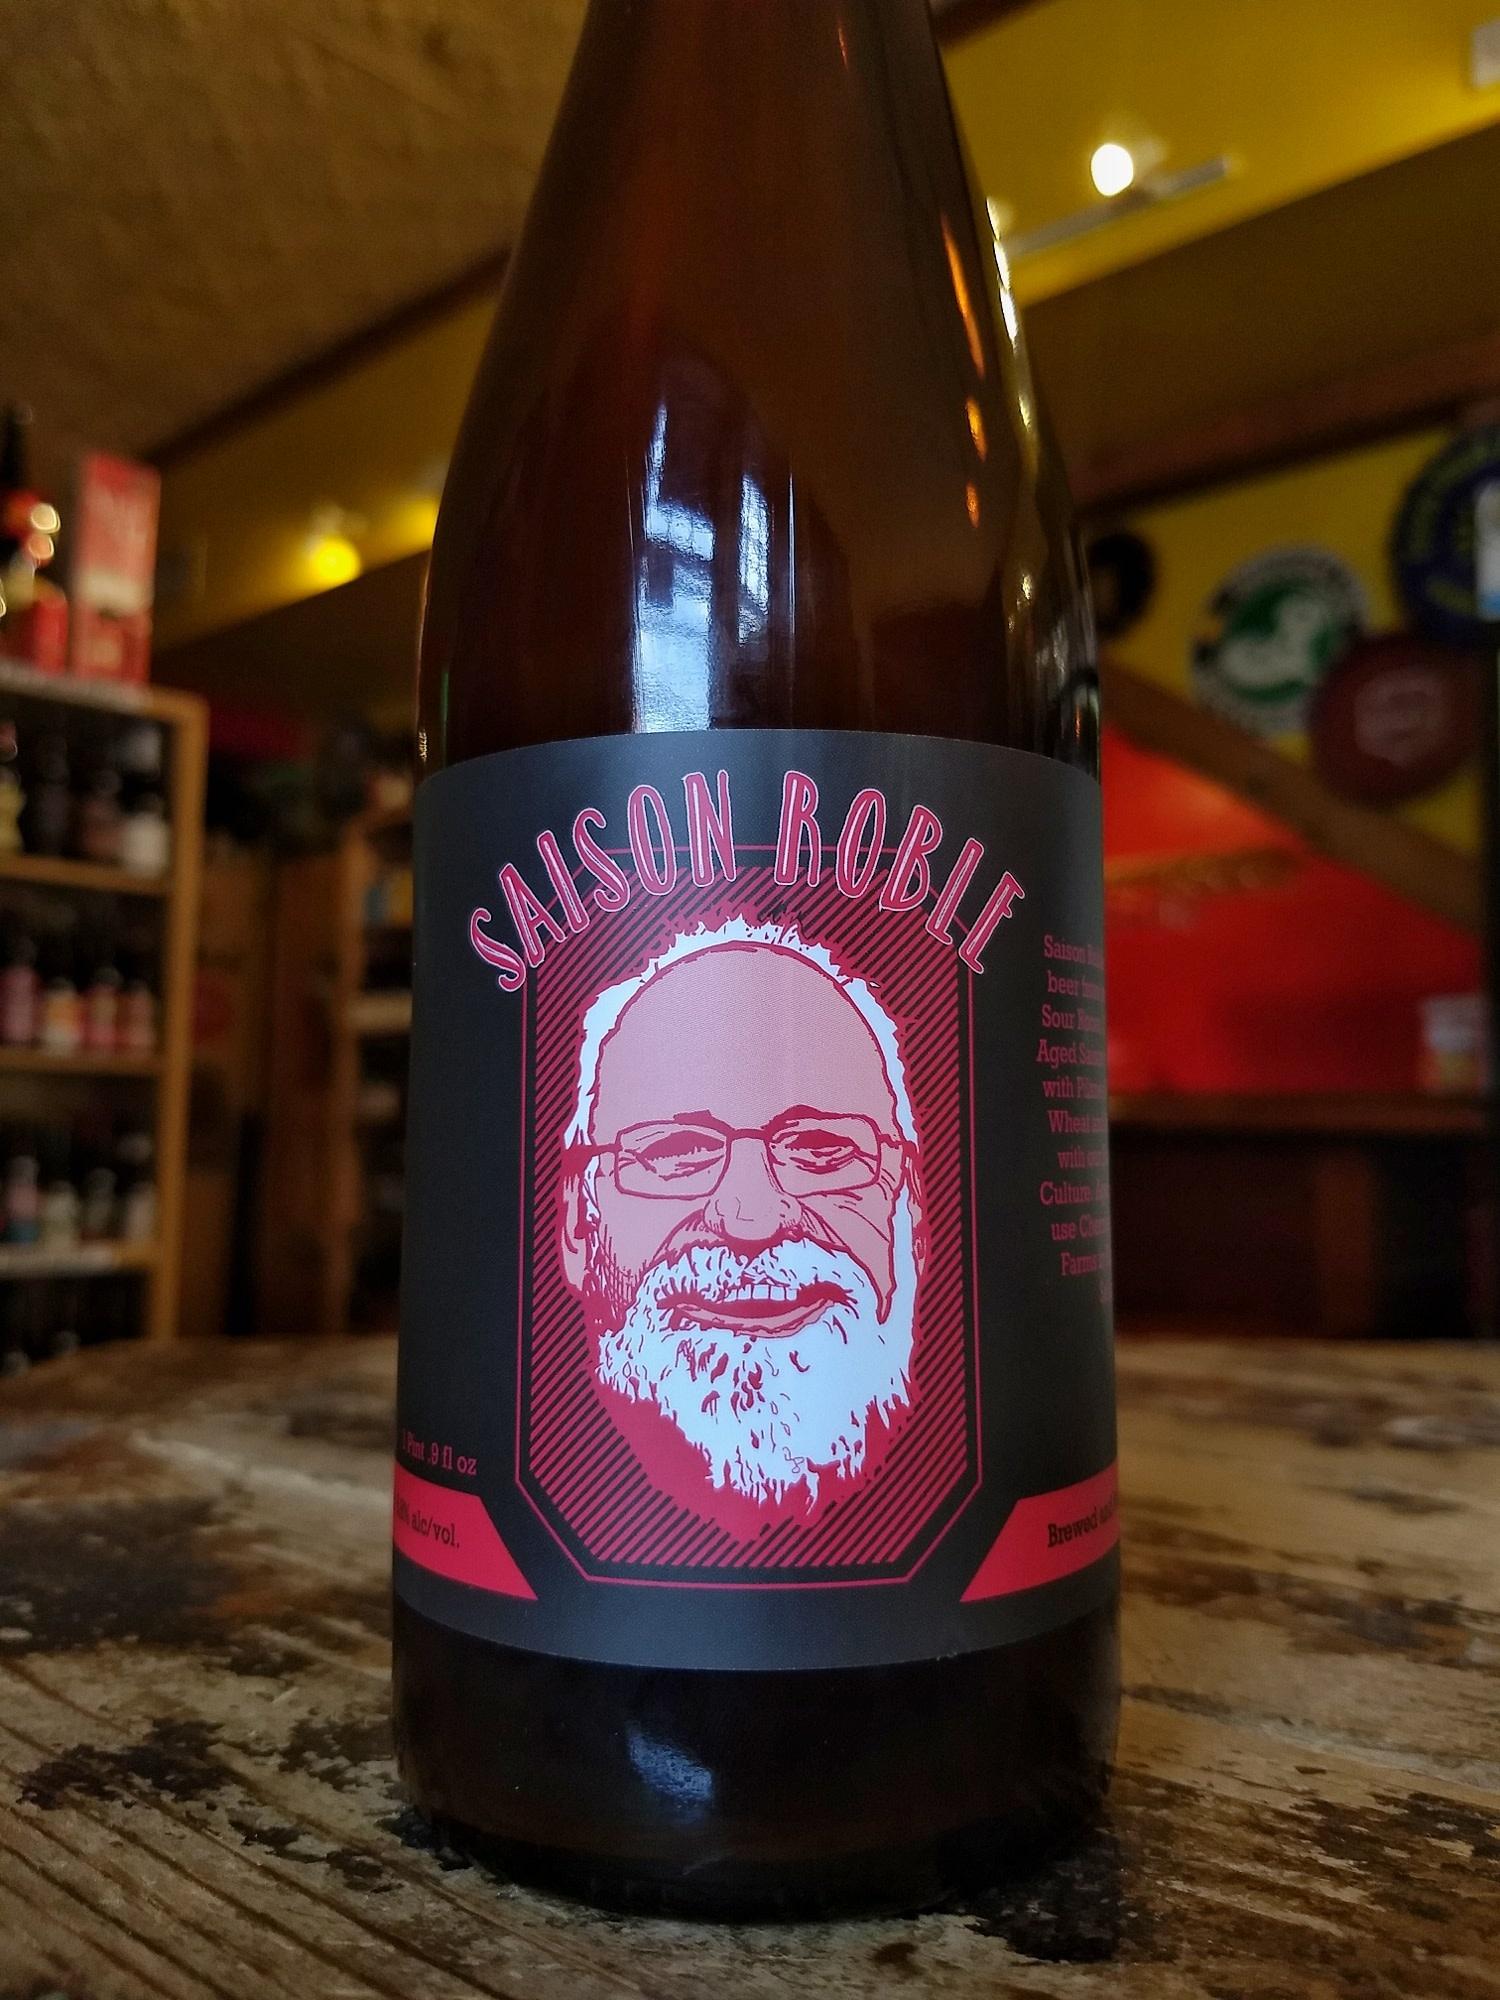 Salud Cerveceria 'Saison Roble' 500ml